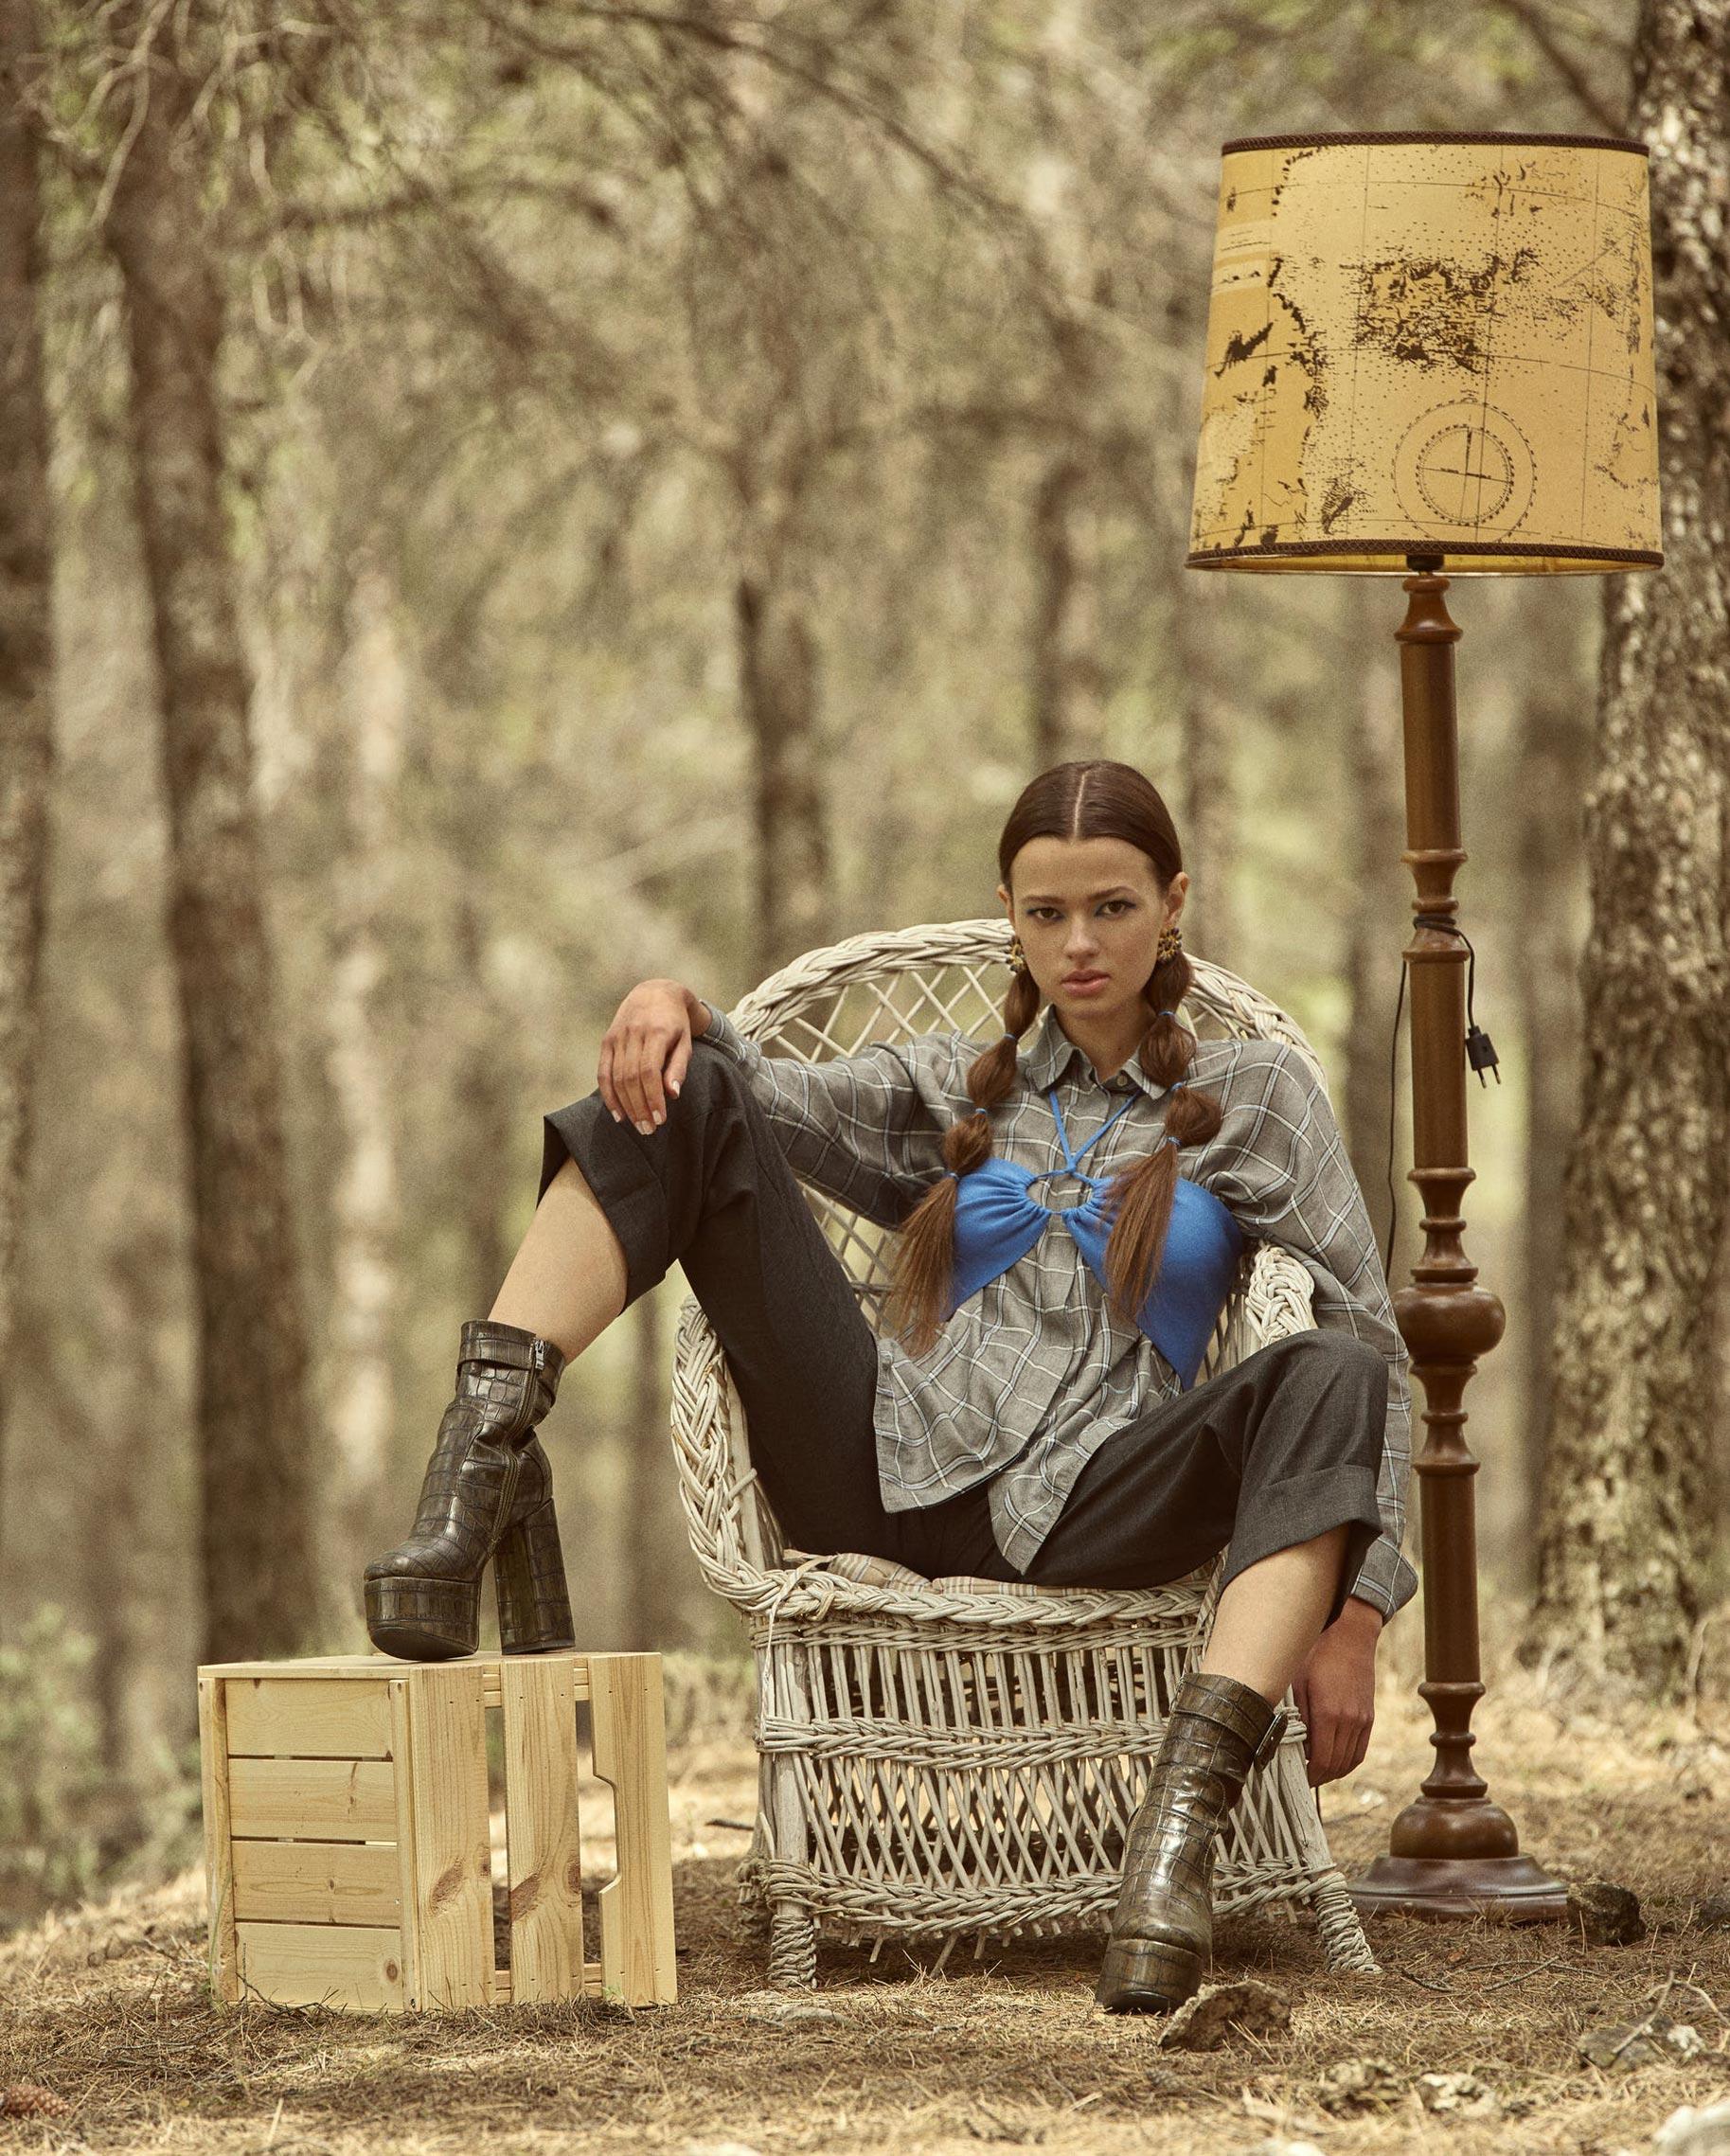 Диана Свиридова в лесу демонстрирует винтажную технику и новинки моды / фото 04